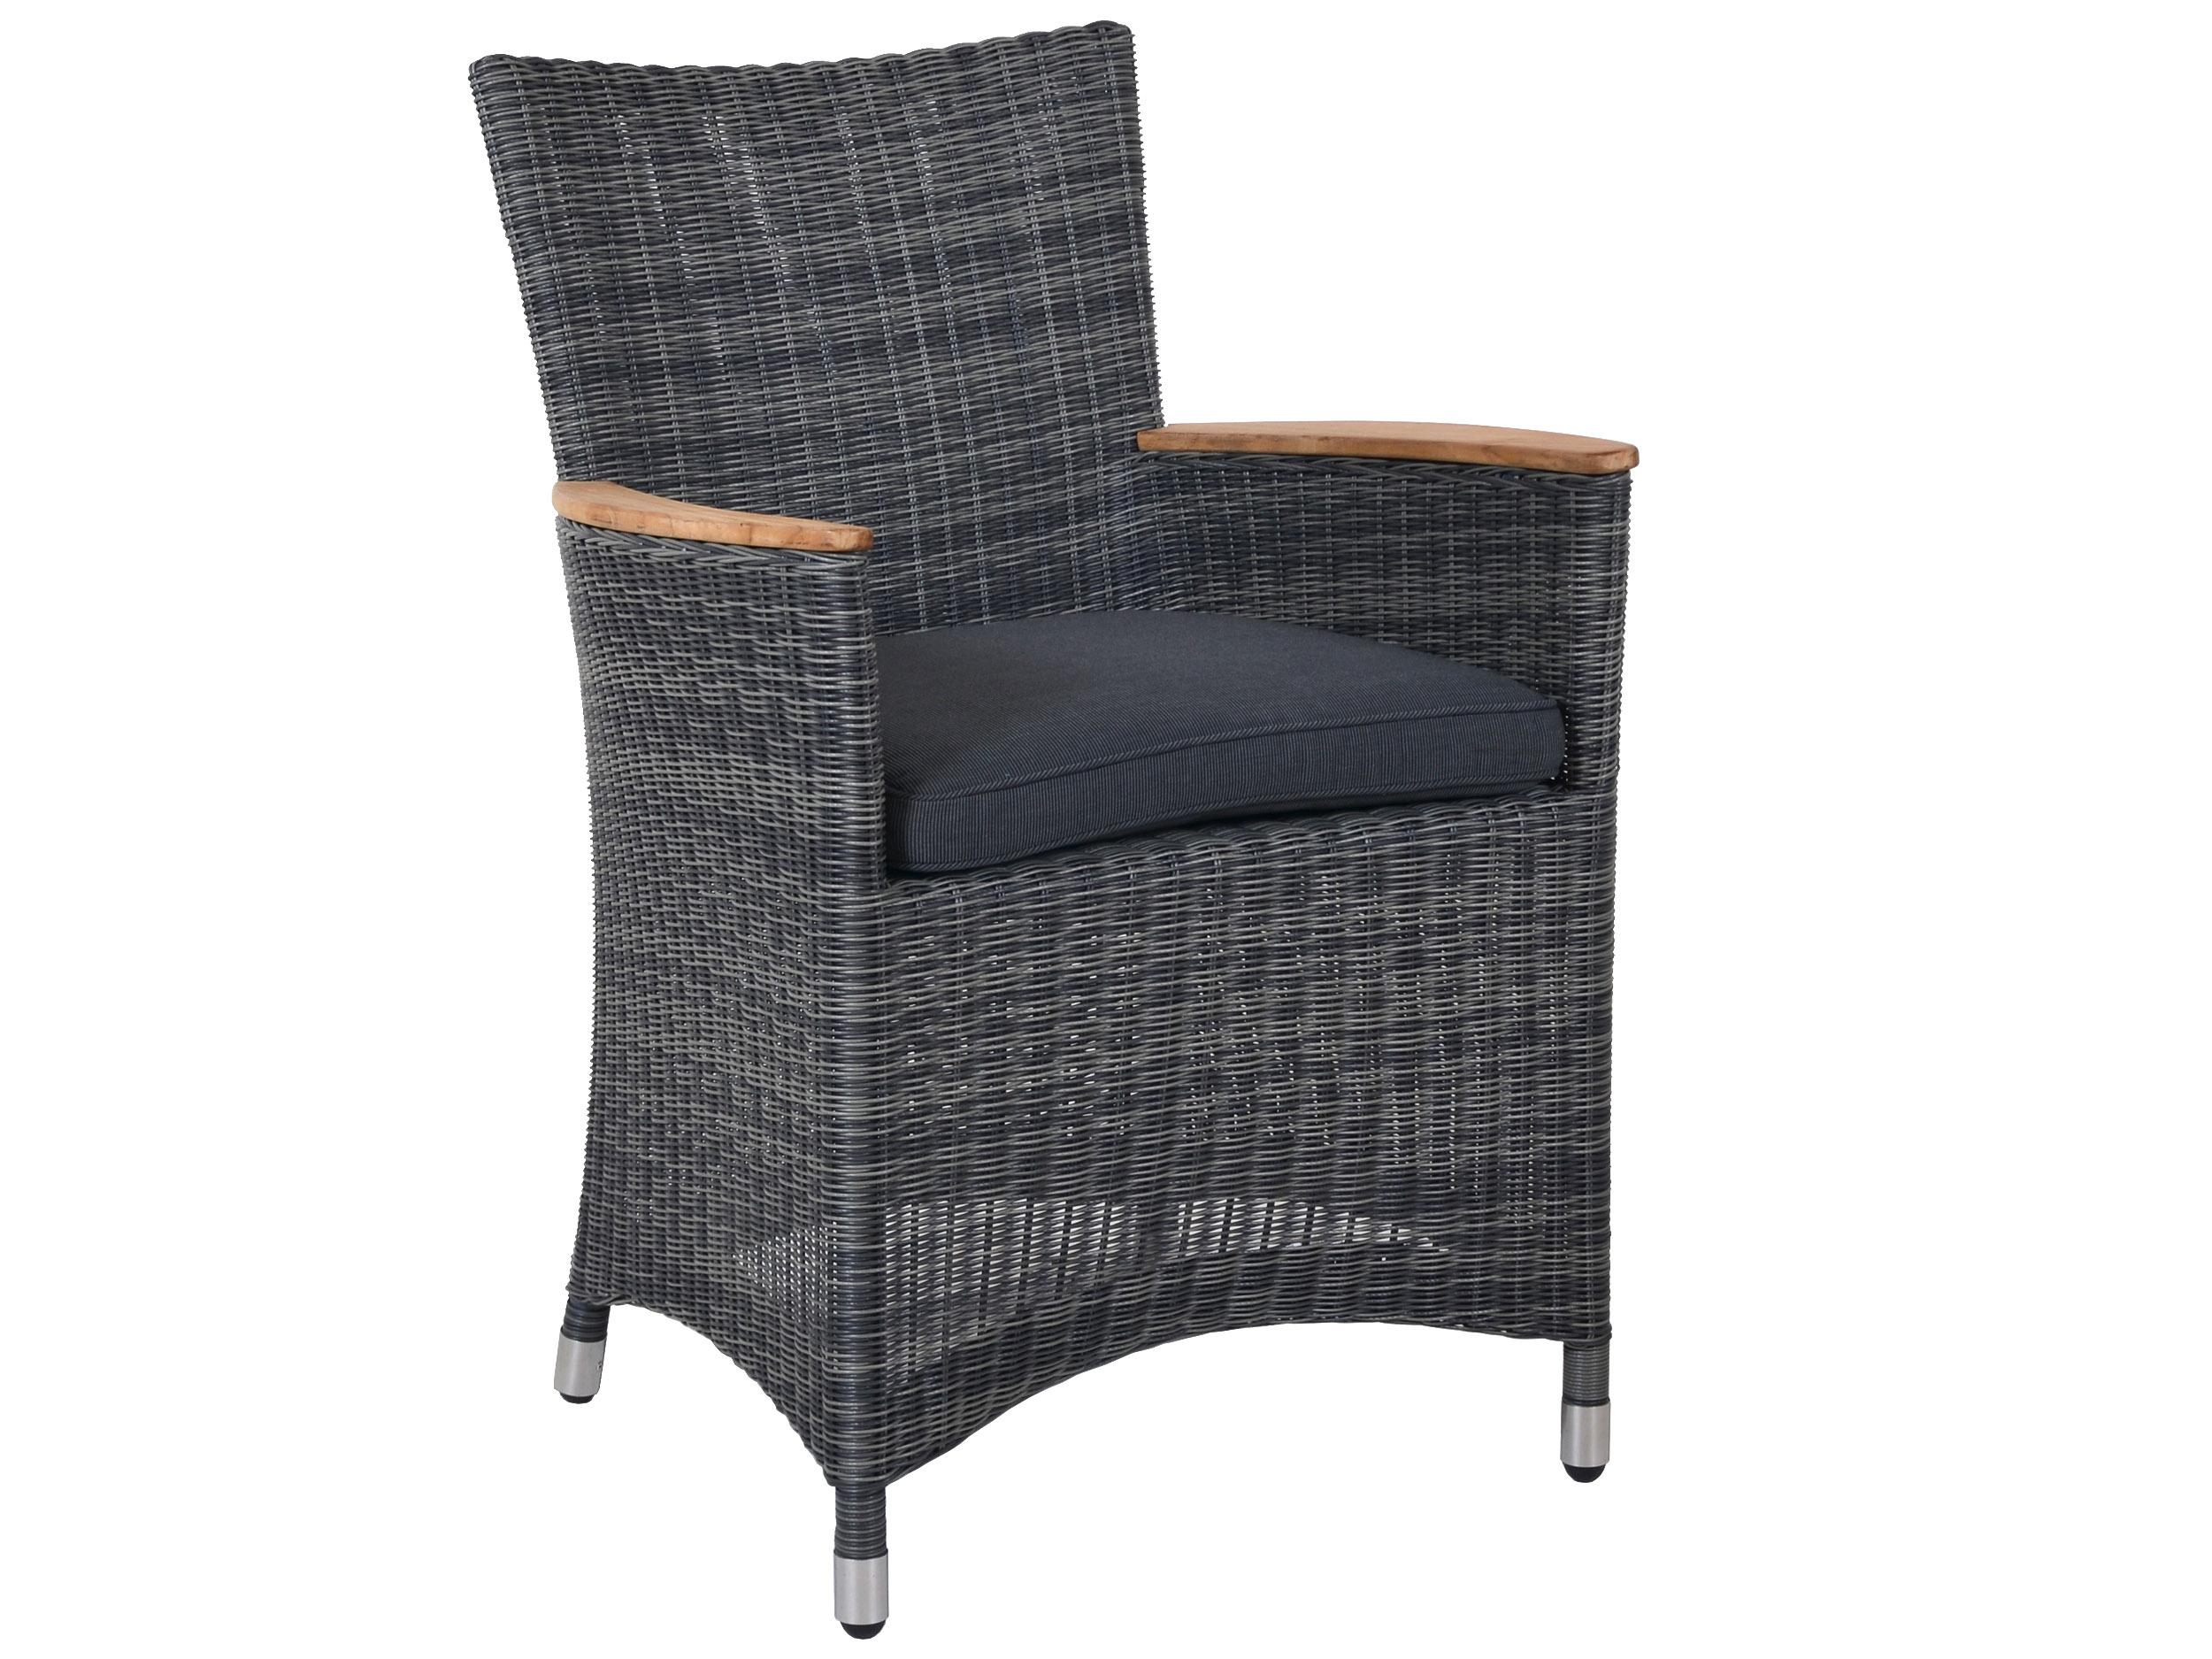 polyrattan sessel long island geflecht stone gartenm bel l nse. Black Bedroom Furniture Sets. Home Design Ideas